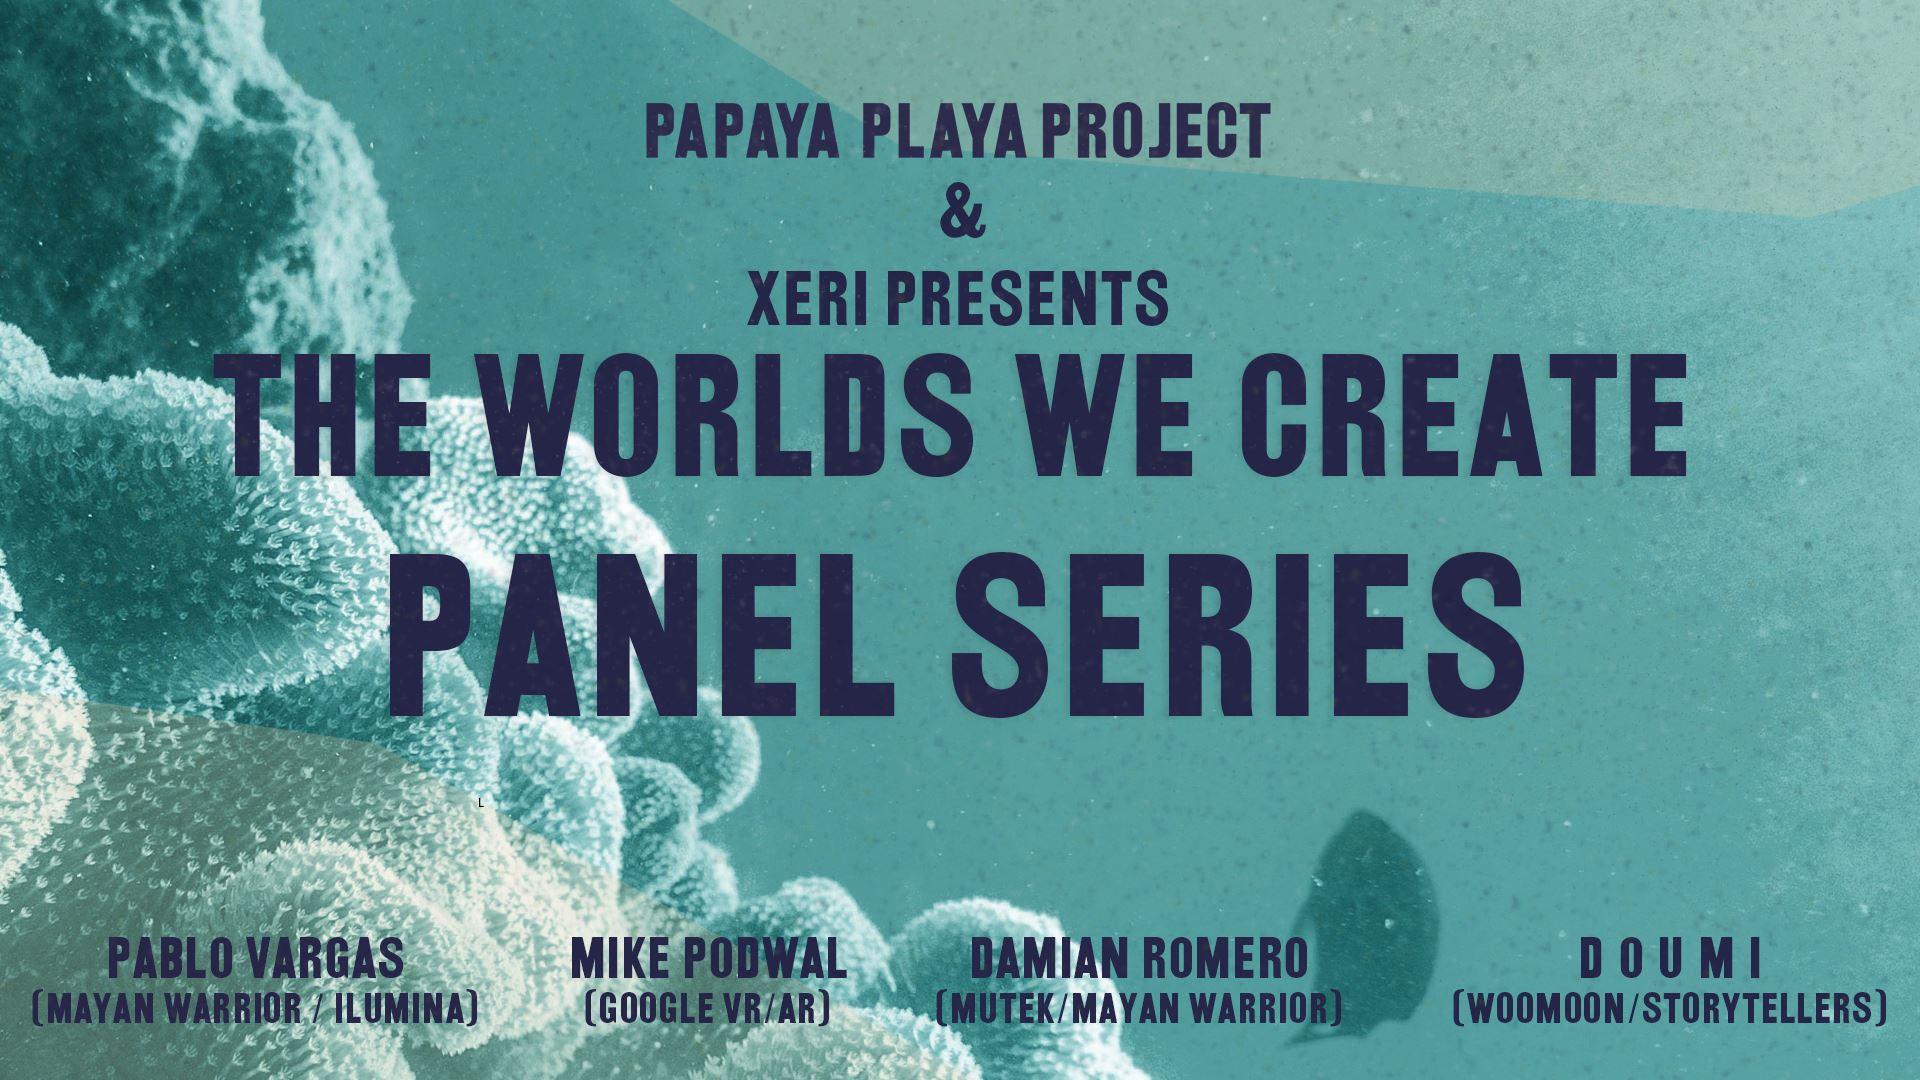 Xeri Presents: The Worlds We Create Panel Series